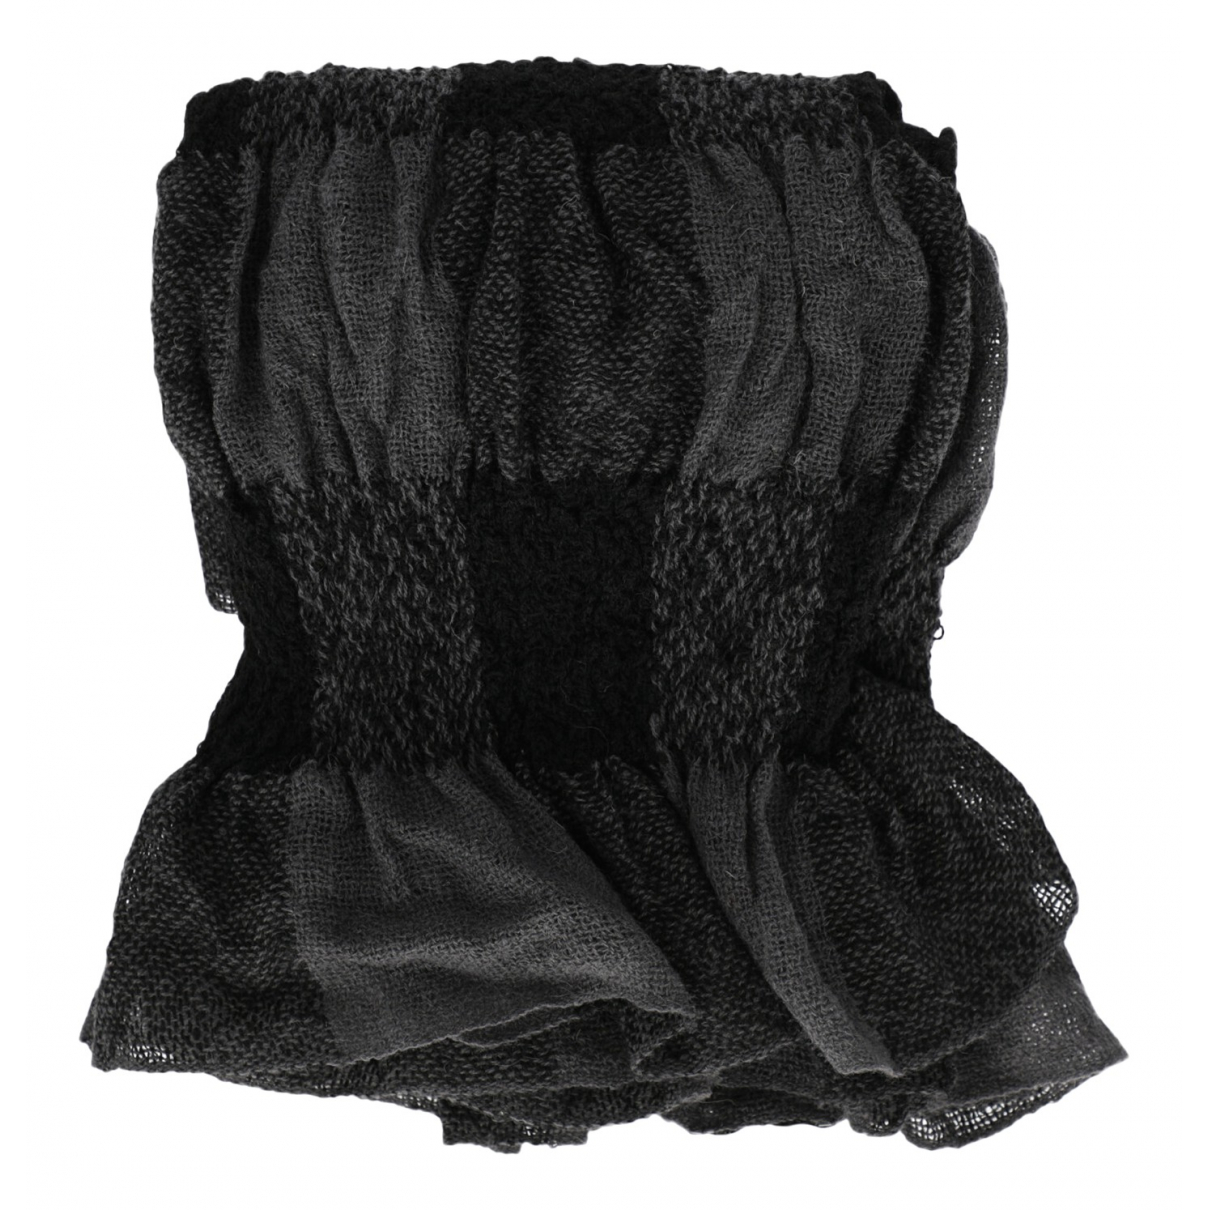 Giorgio Armani - Foulard   pour femme en laine - noir